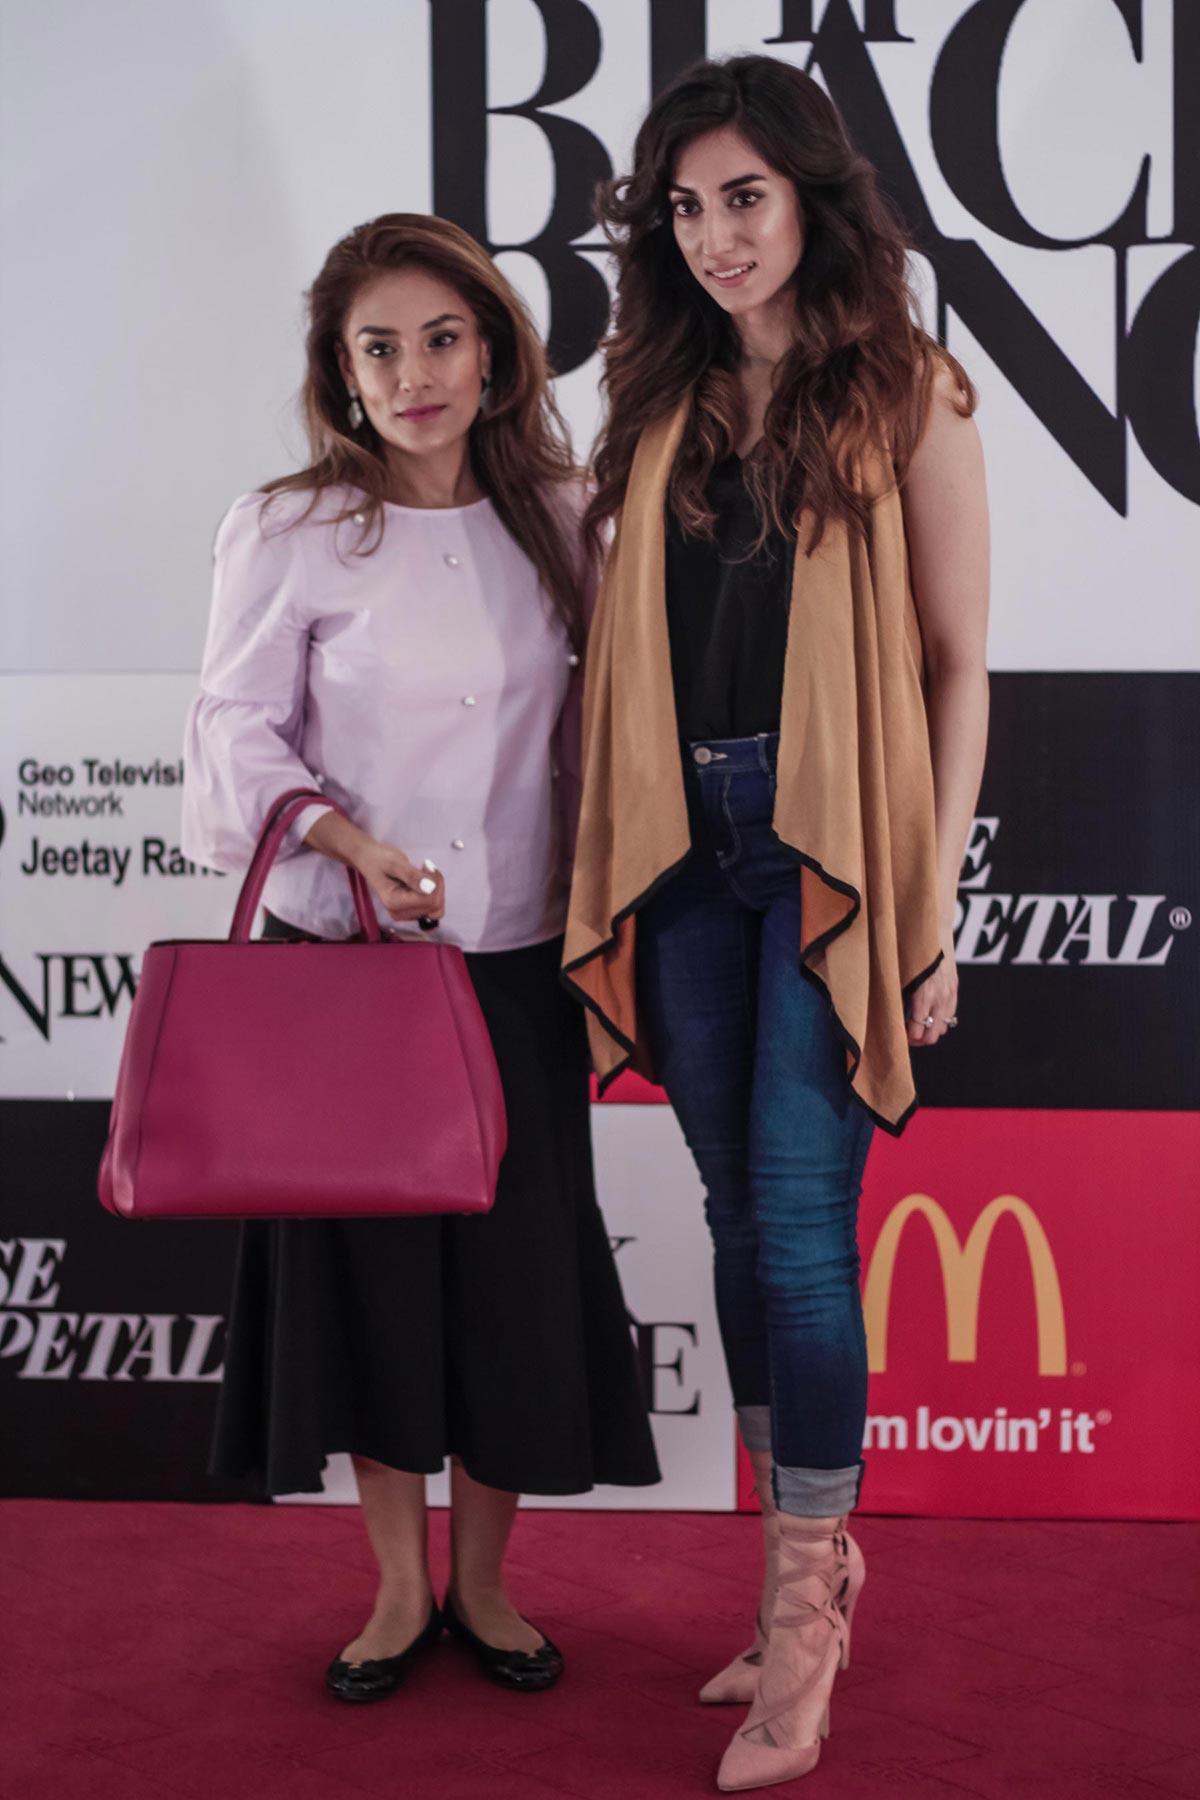 Zehra Gilani and Sahar Noon